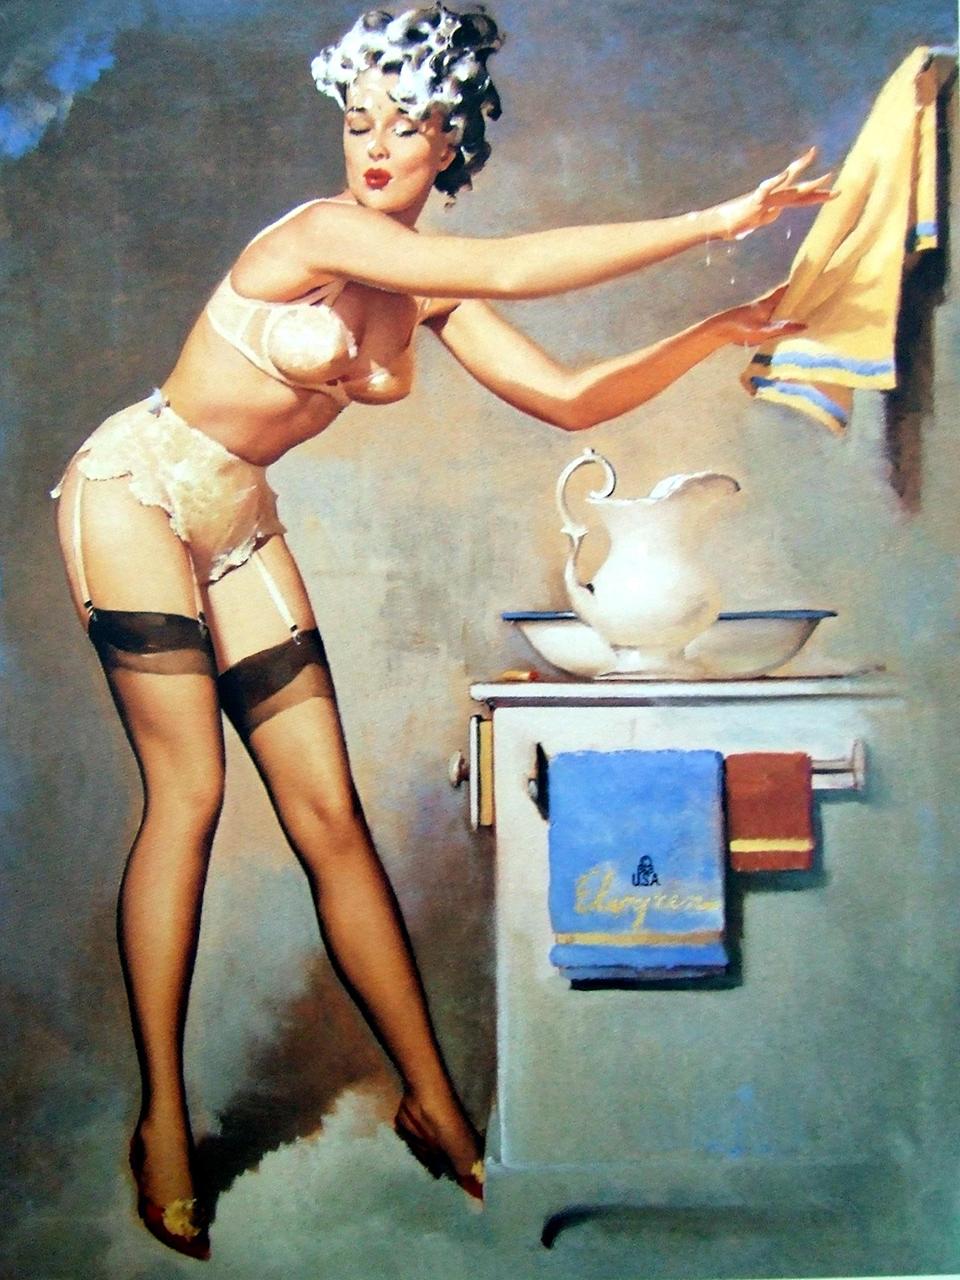 Постер (плакат) Джил Элвгрен: Eye catcher